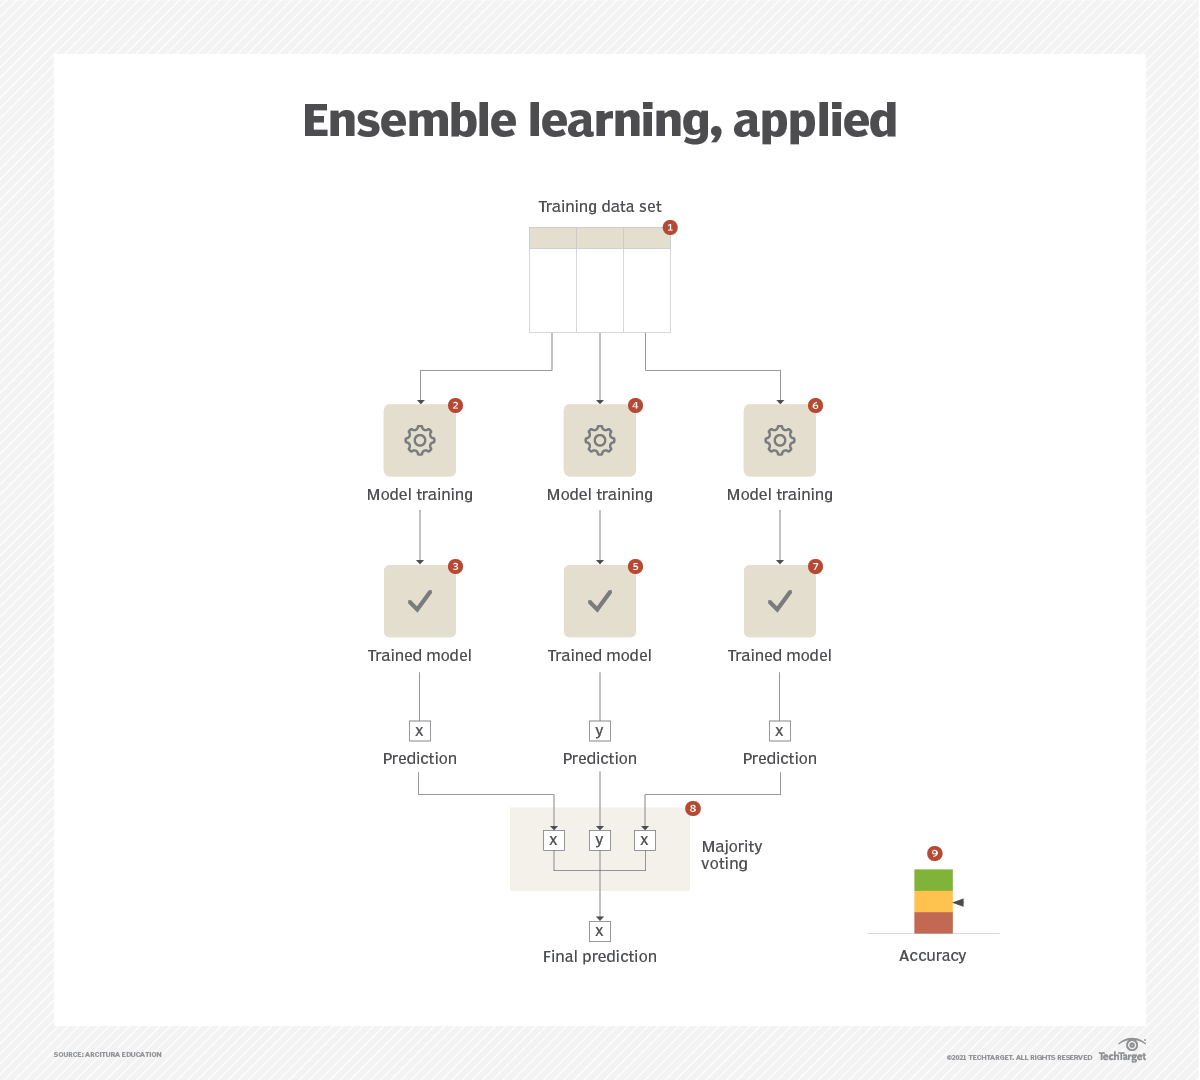 Ensemble learning, applied